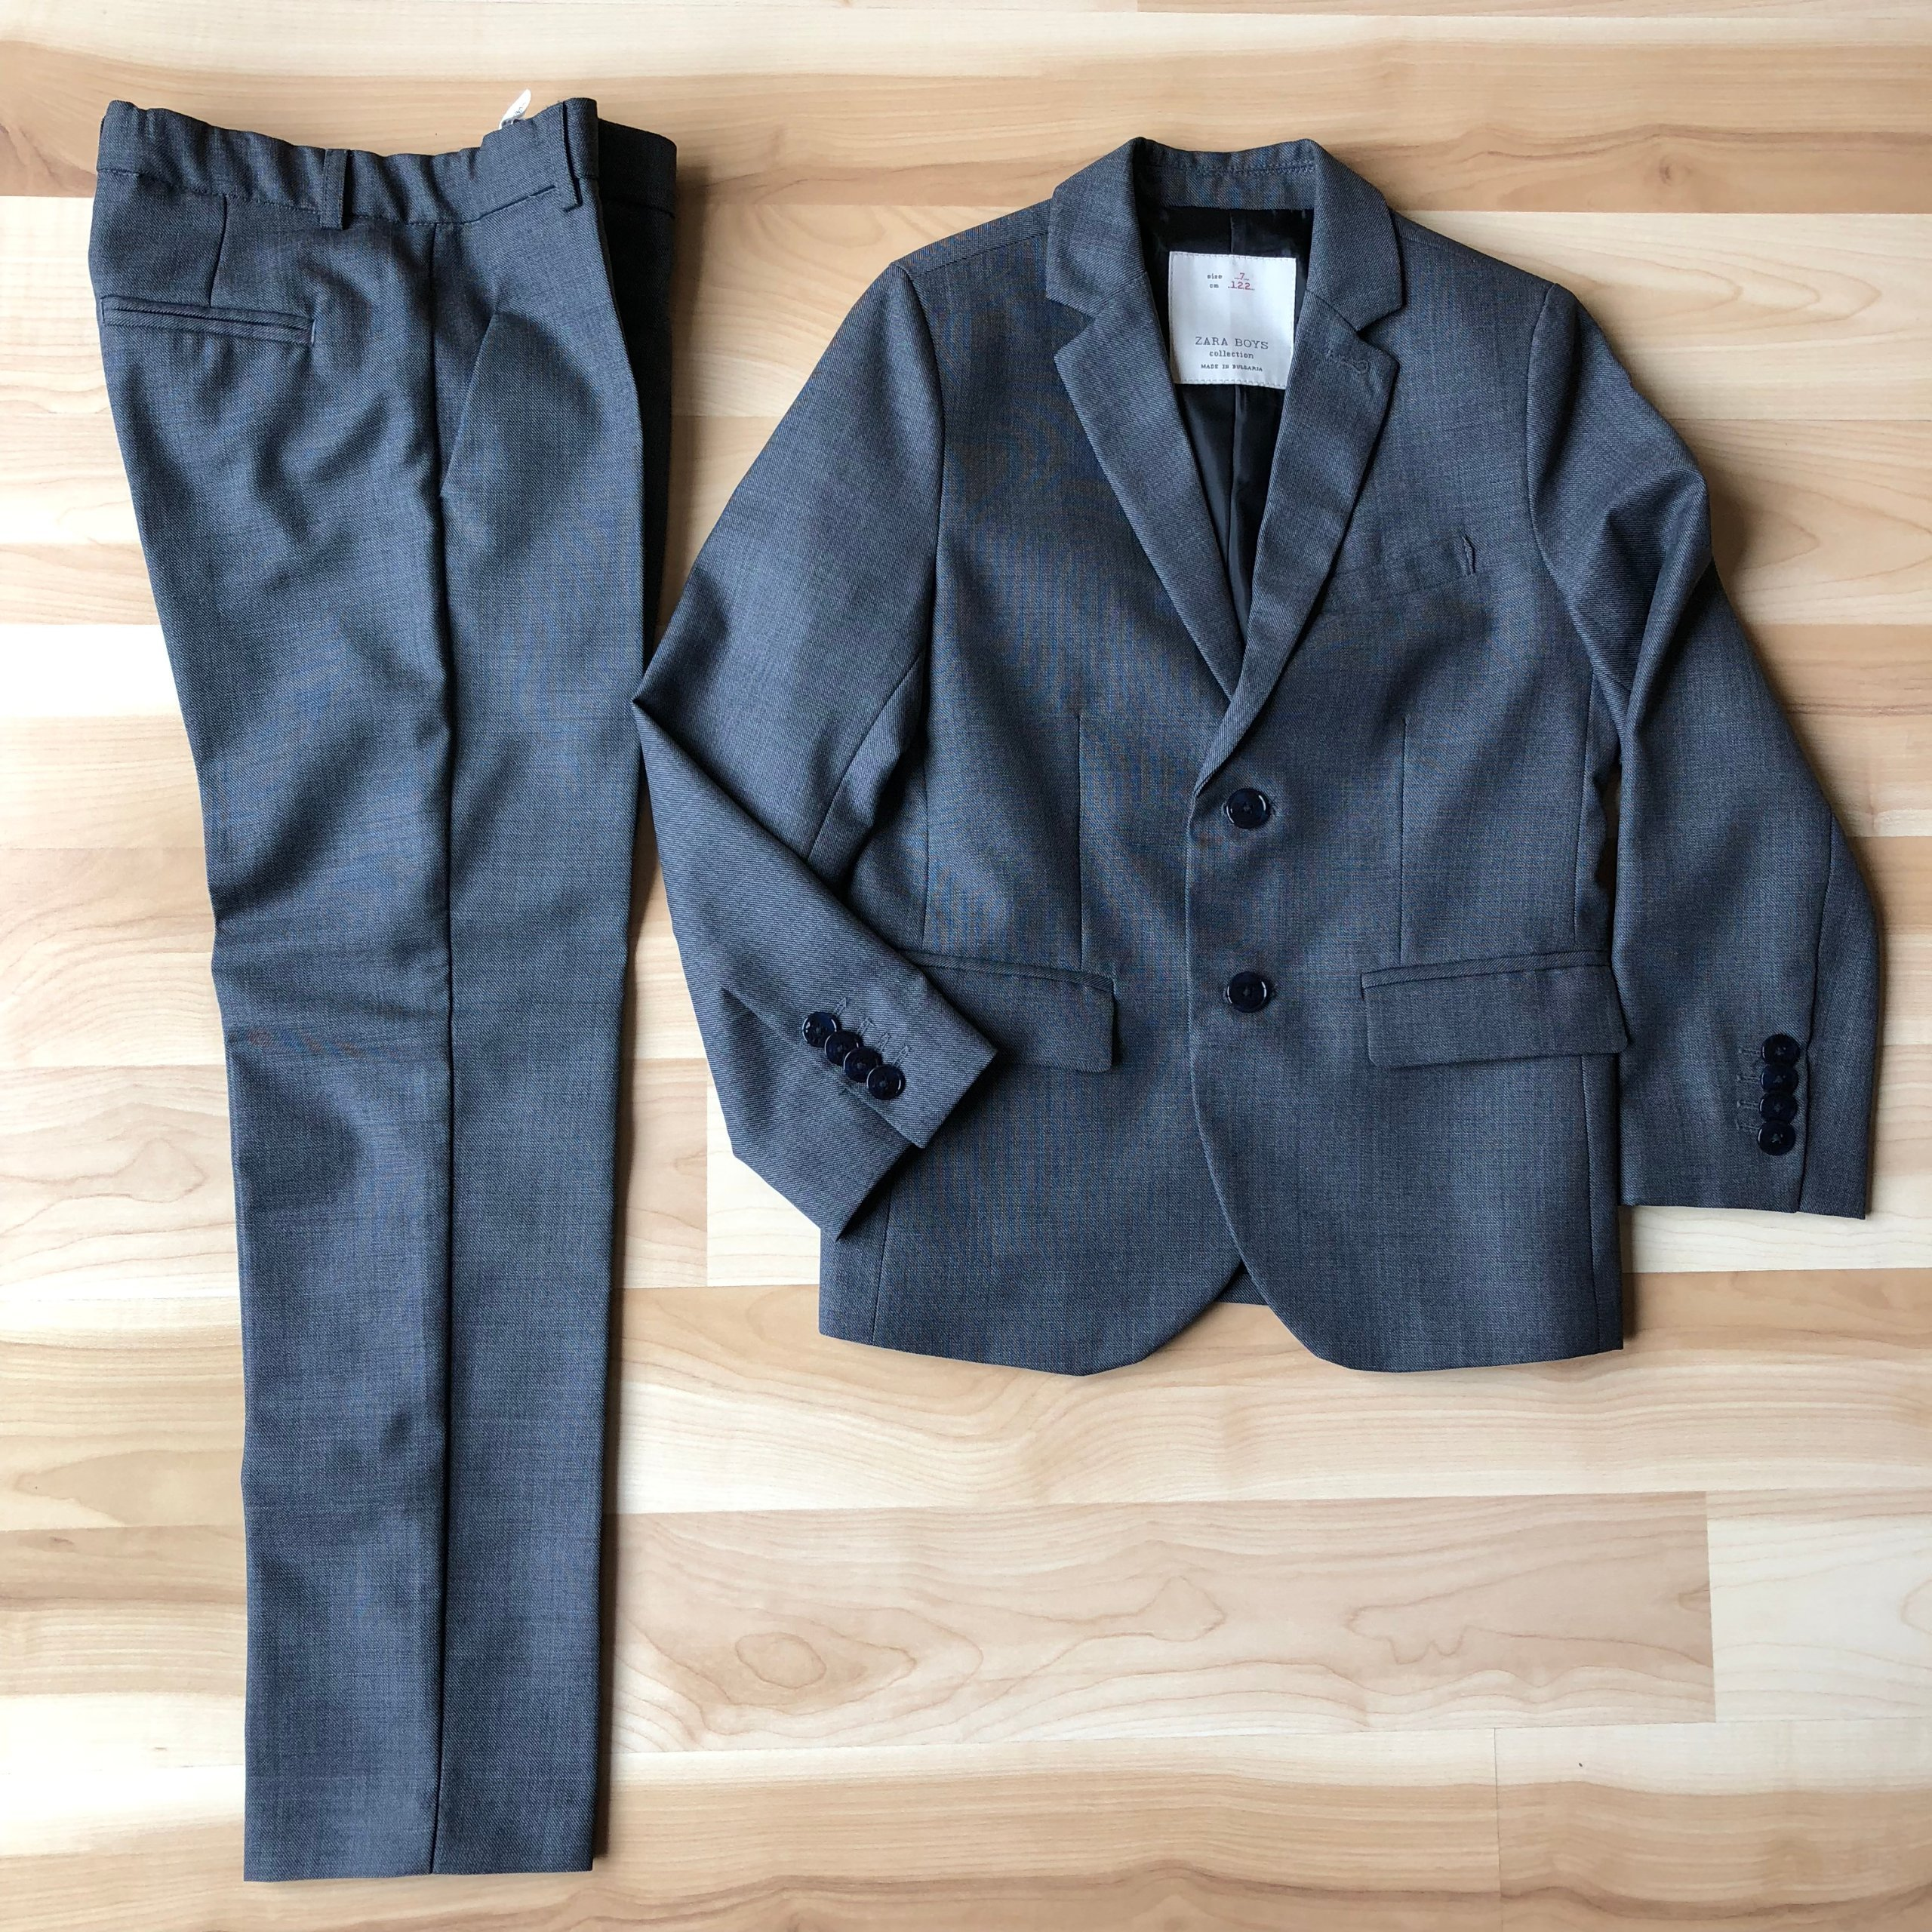 4b84cfaf6f734 Zara GARNITUR Marynarka Spodnie + Koszula 122 cm 7 - 7352400266 ...